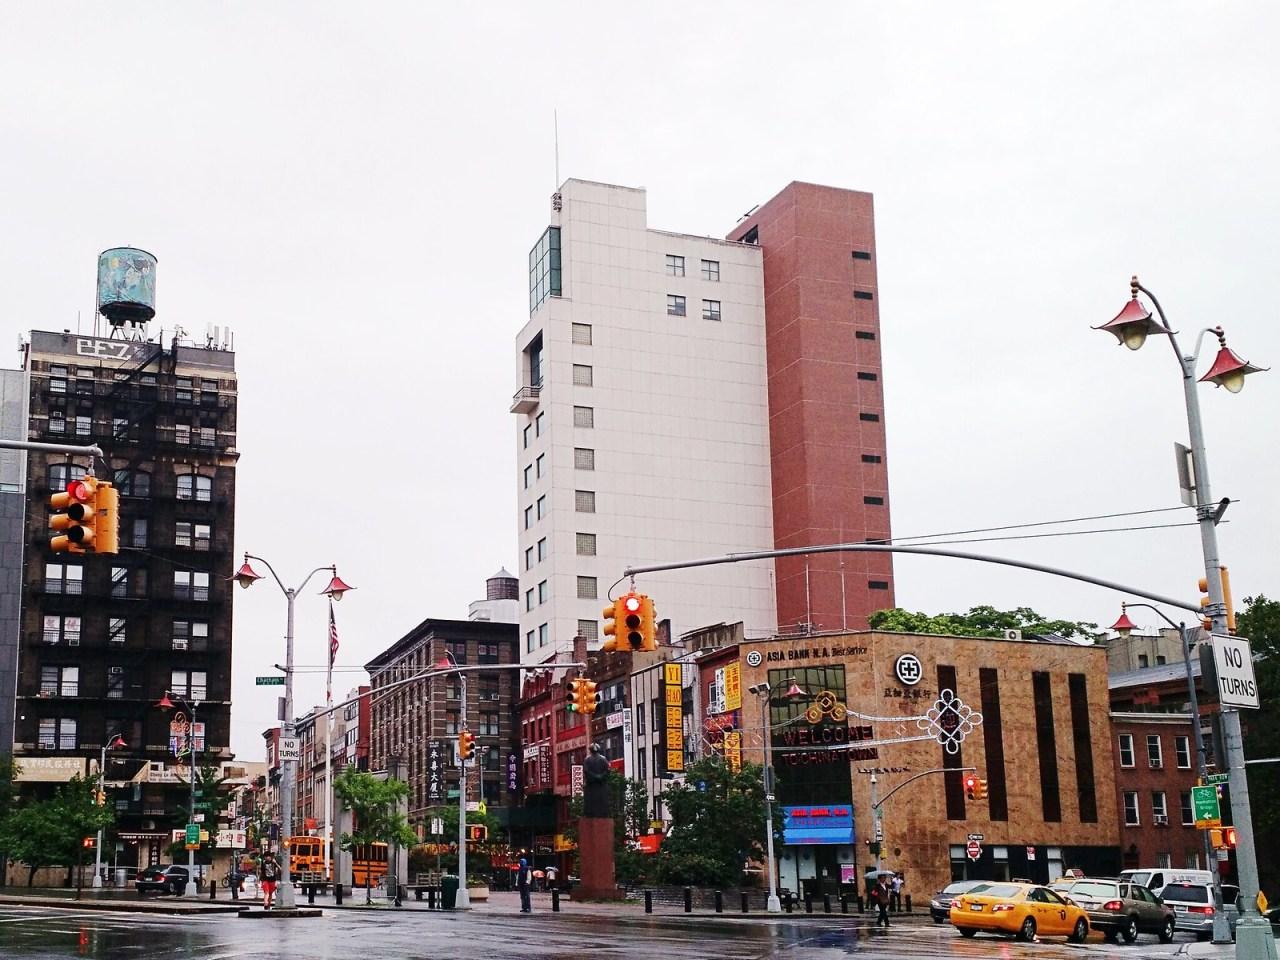 Walking to Chinatown in New York